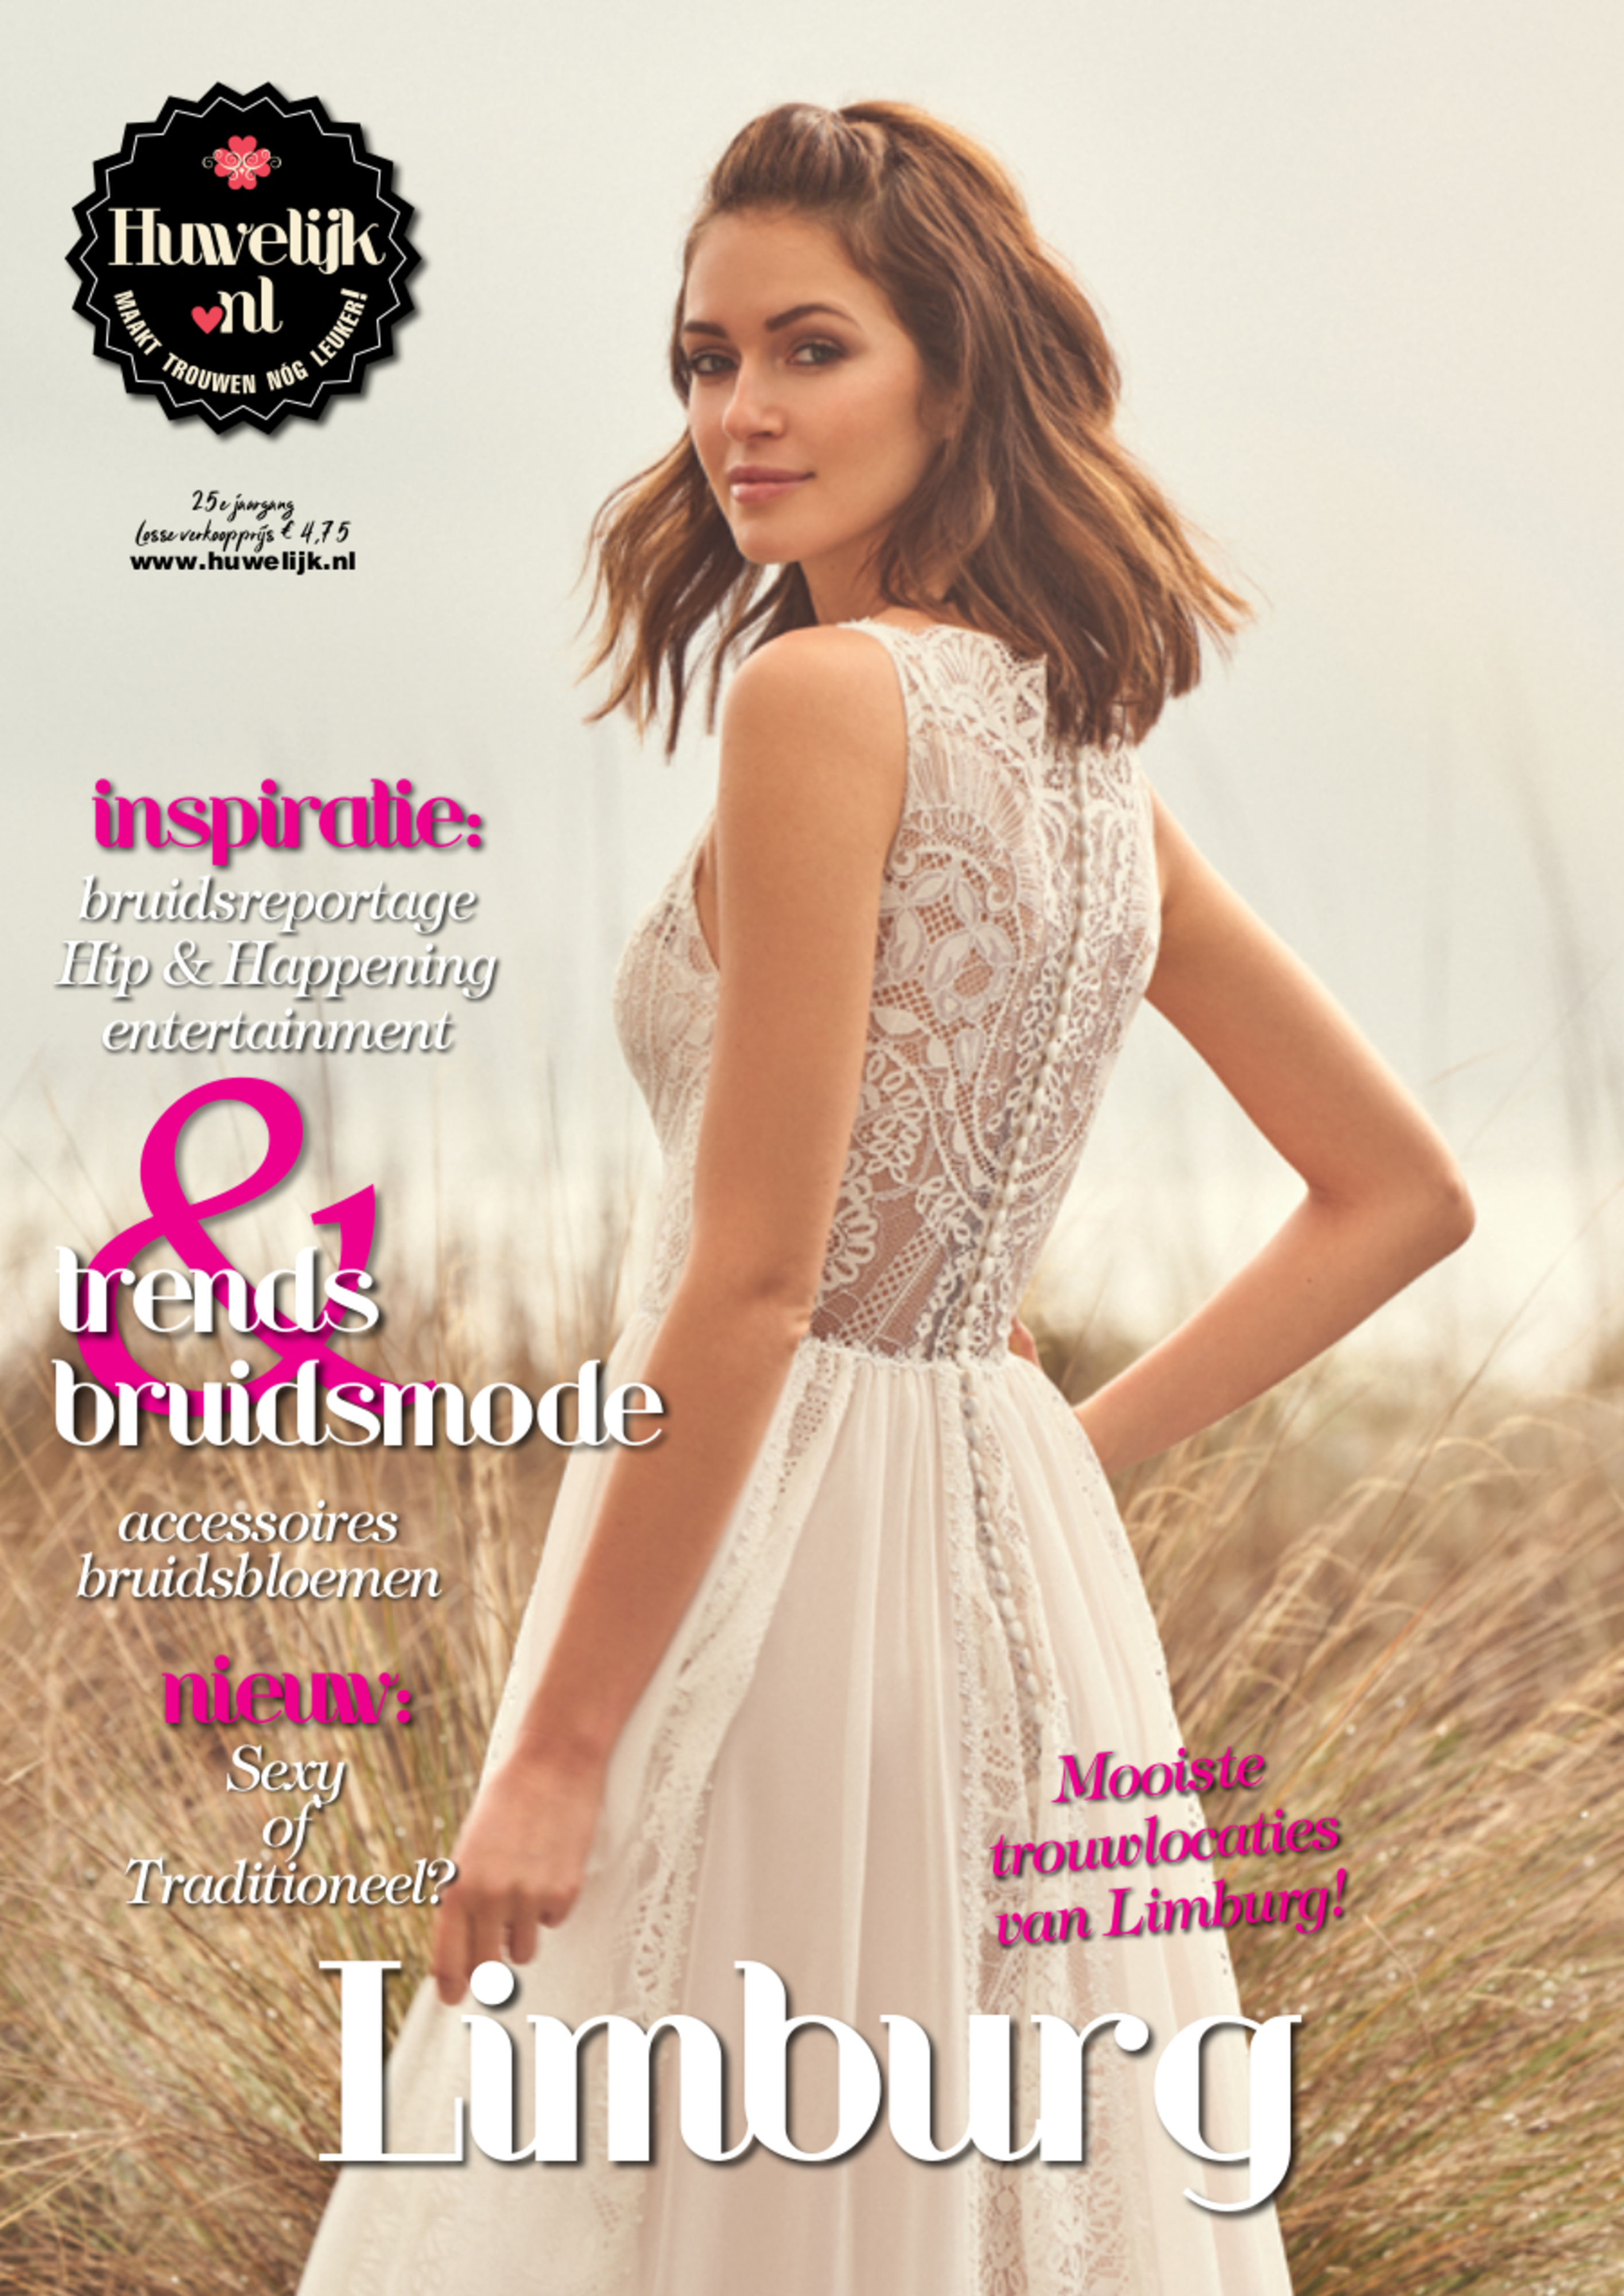 Bruidsmagazine over trouwen in Limburg